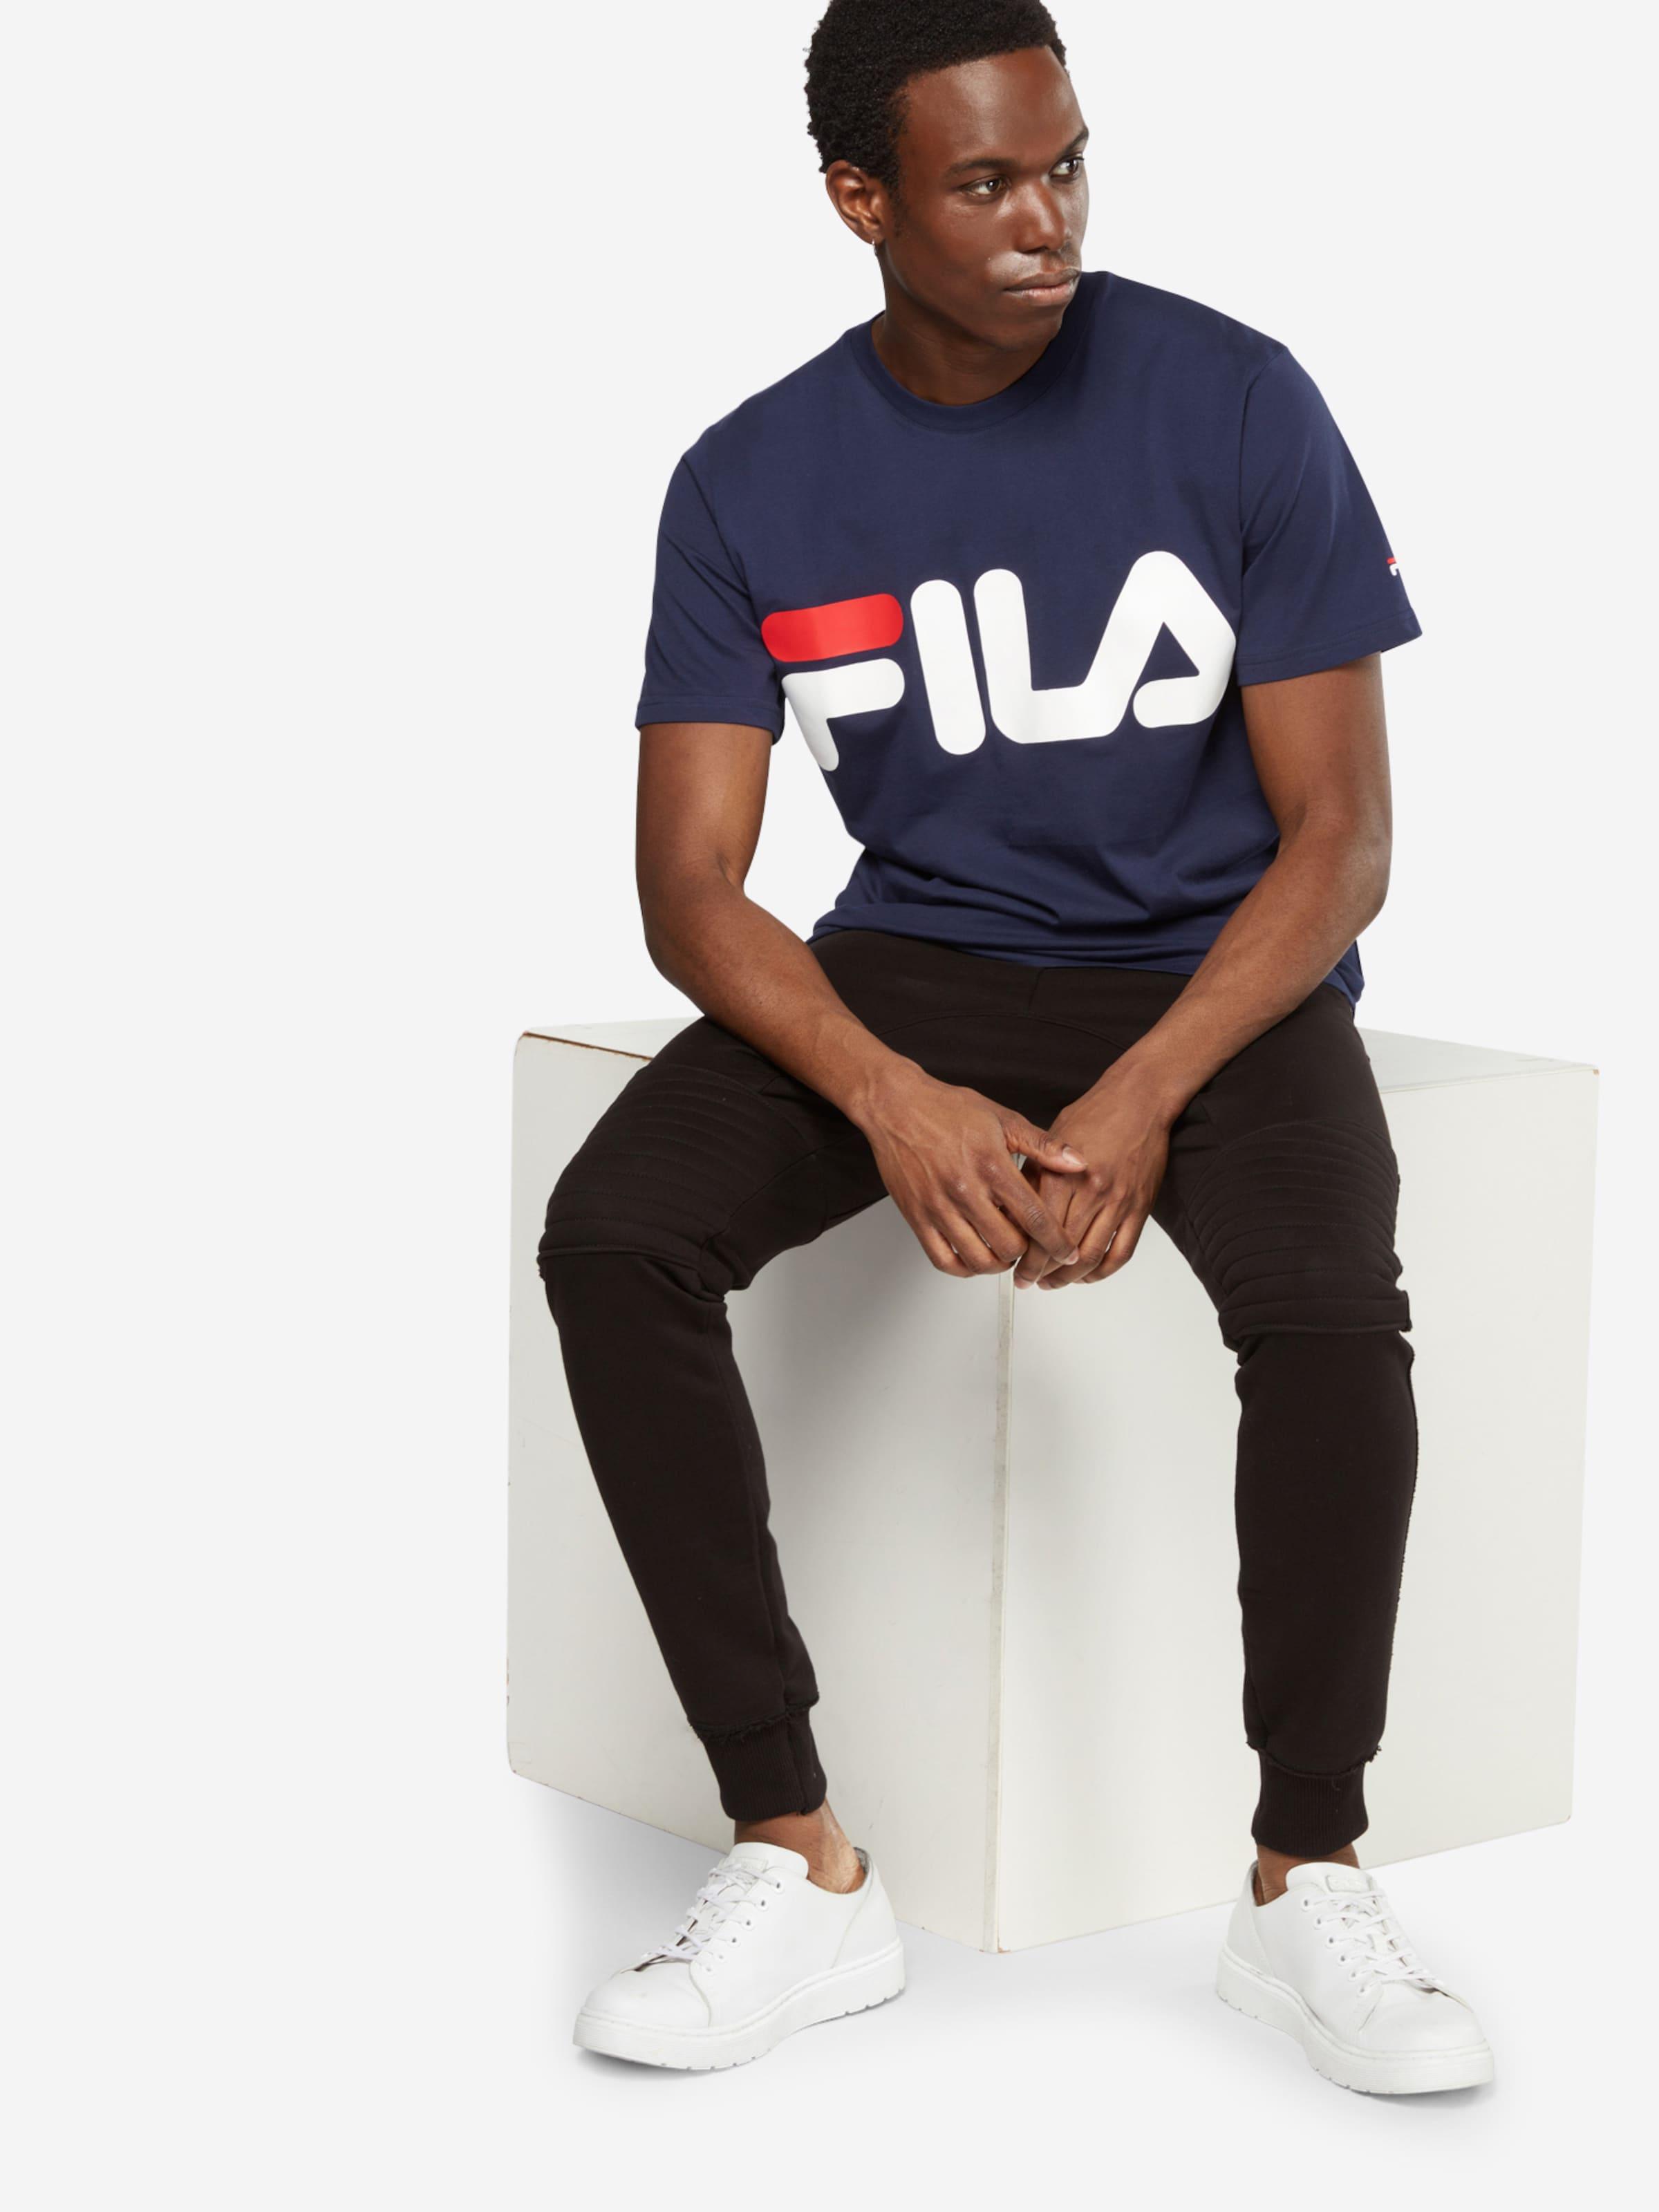 T Shirt T Shirt FILA FILA Tee' FILA Tee' 'Classic Logo FILA Logo 'Classic Shirt Tee' 'Classic Logo T wA8qPXq